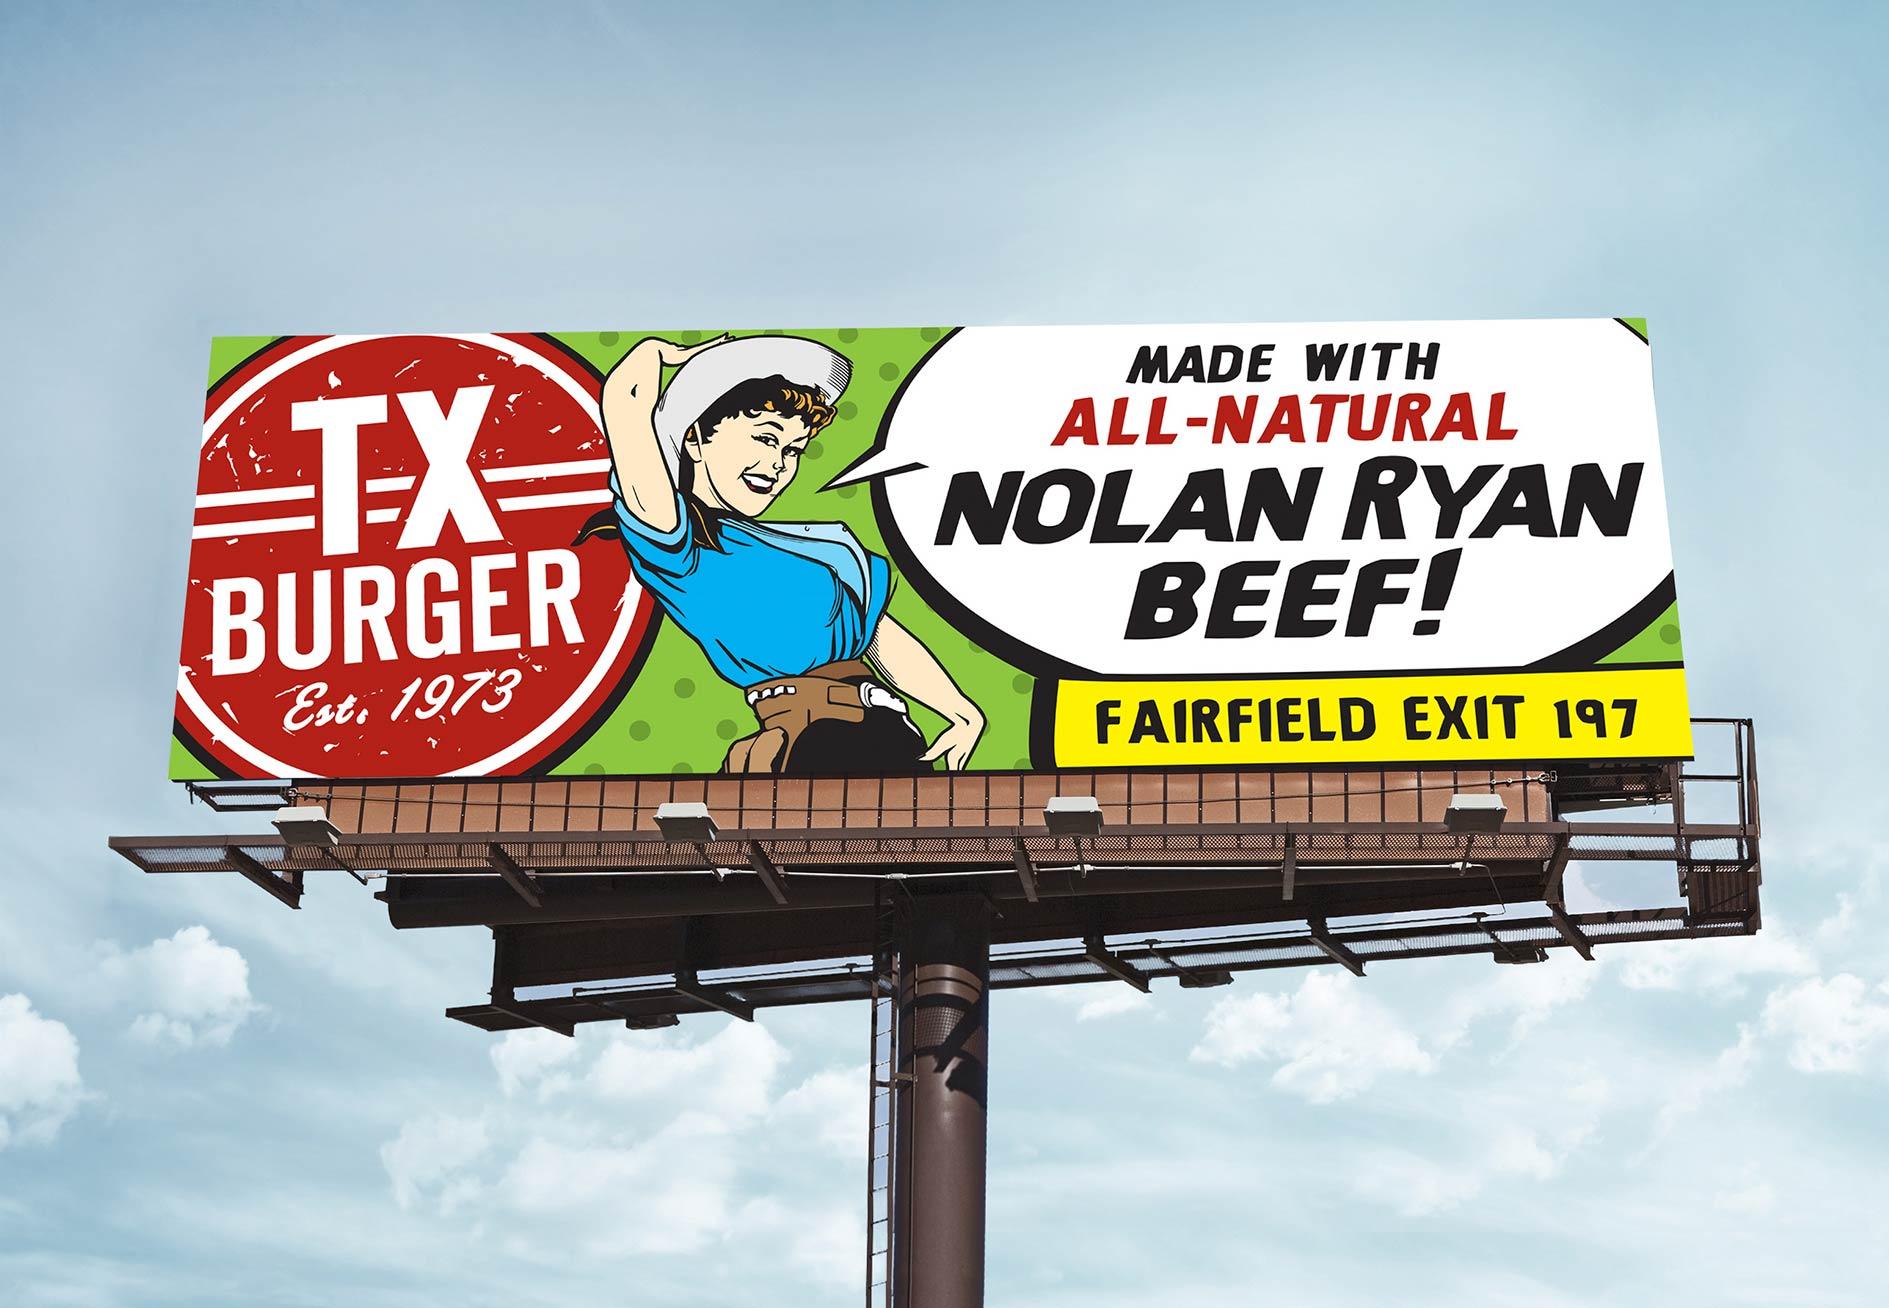 Liberals stand their ground against Texas billboard